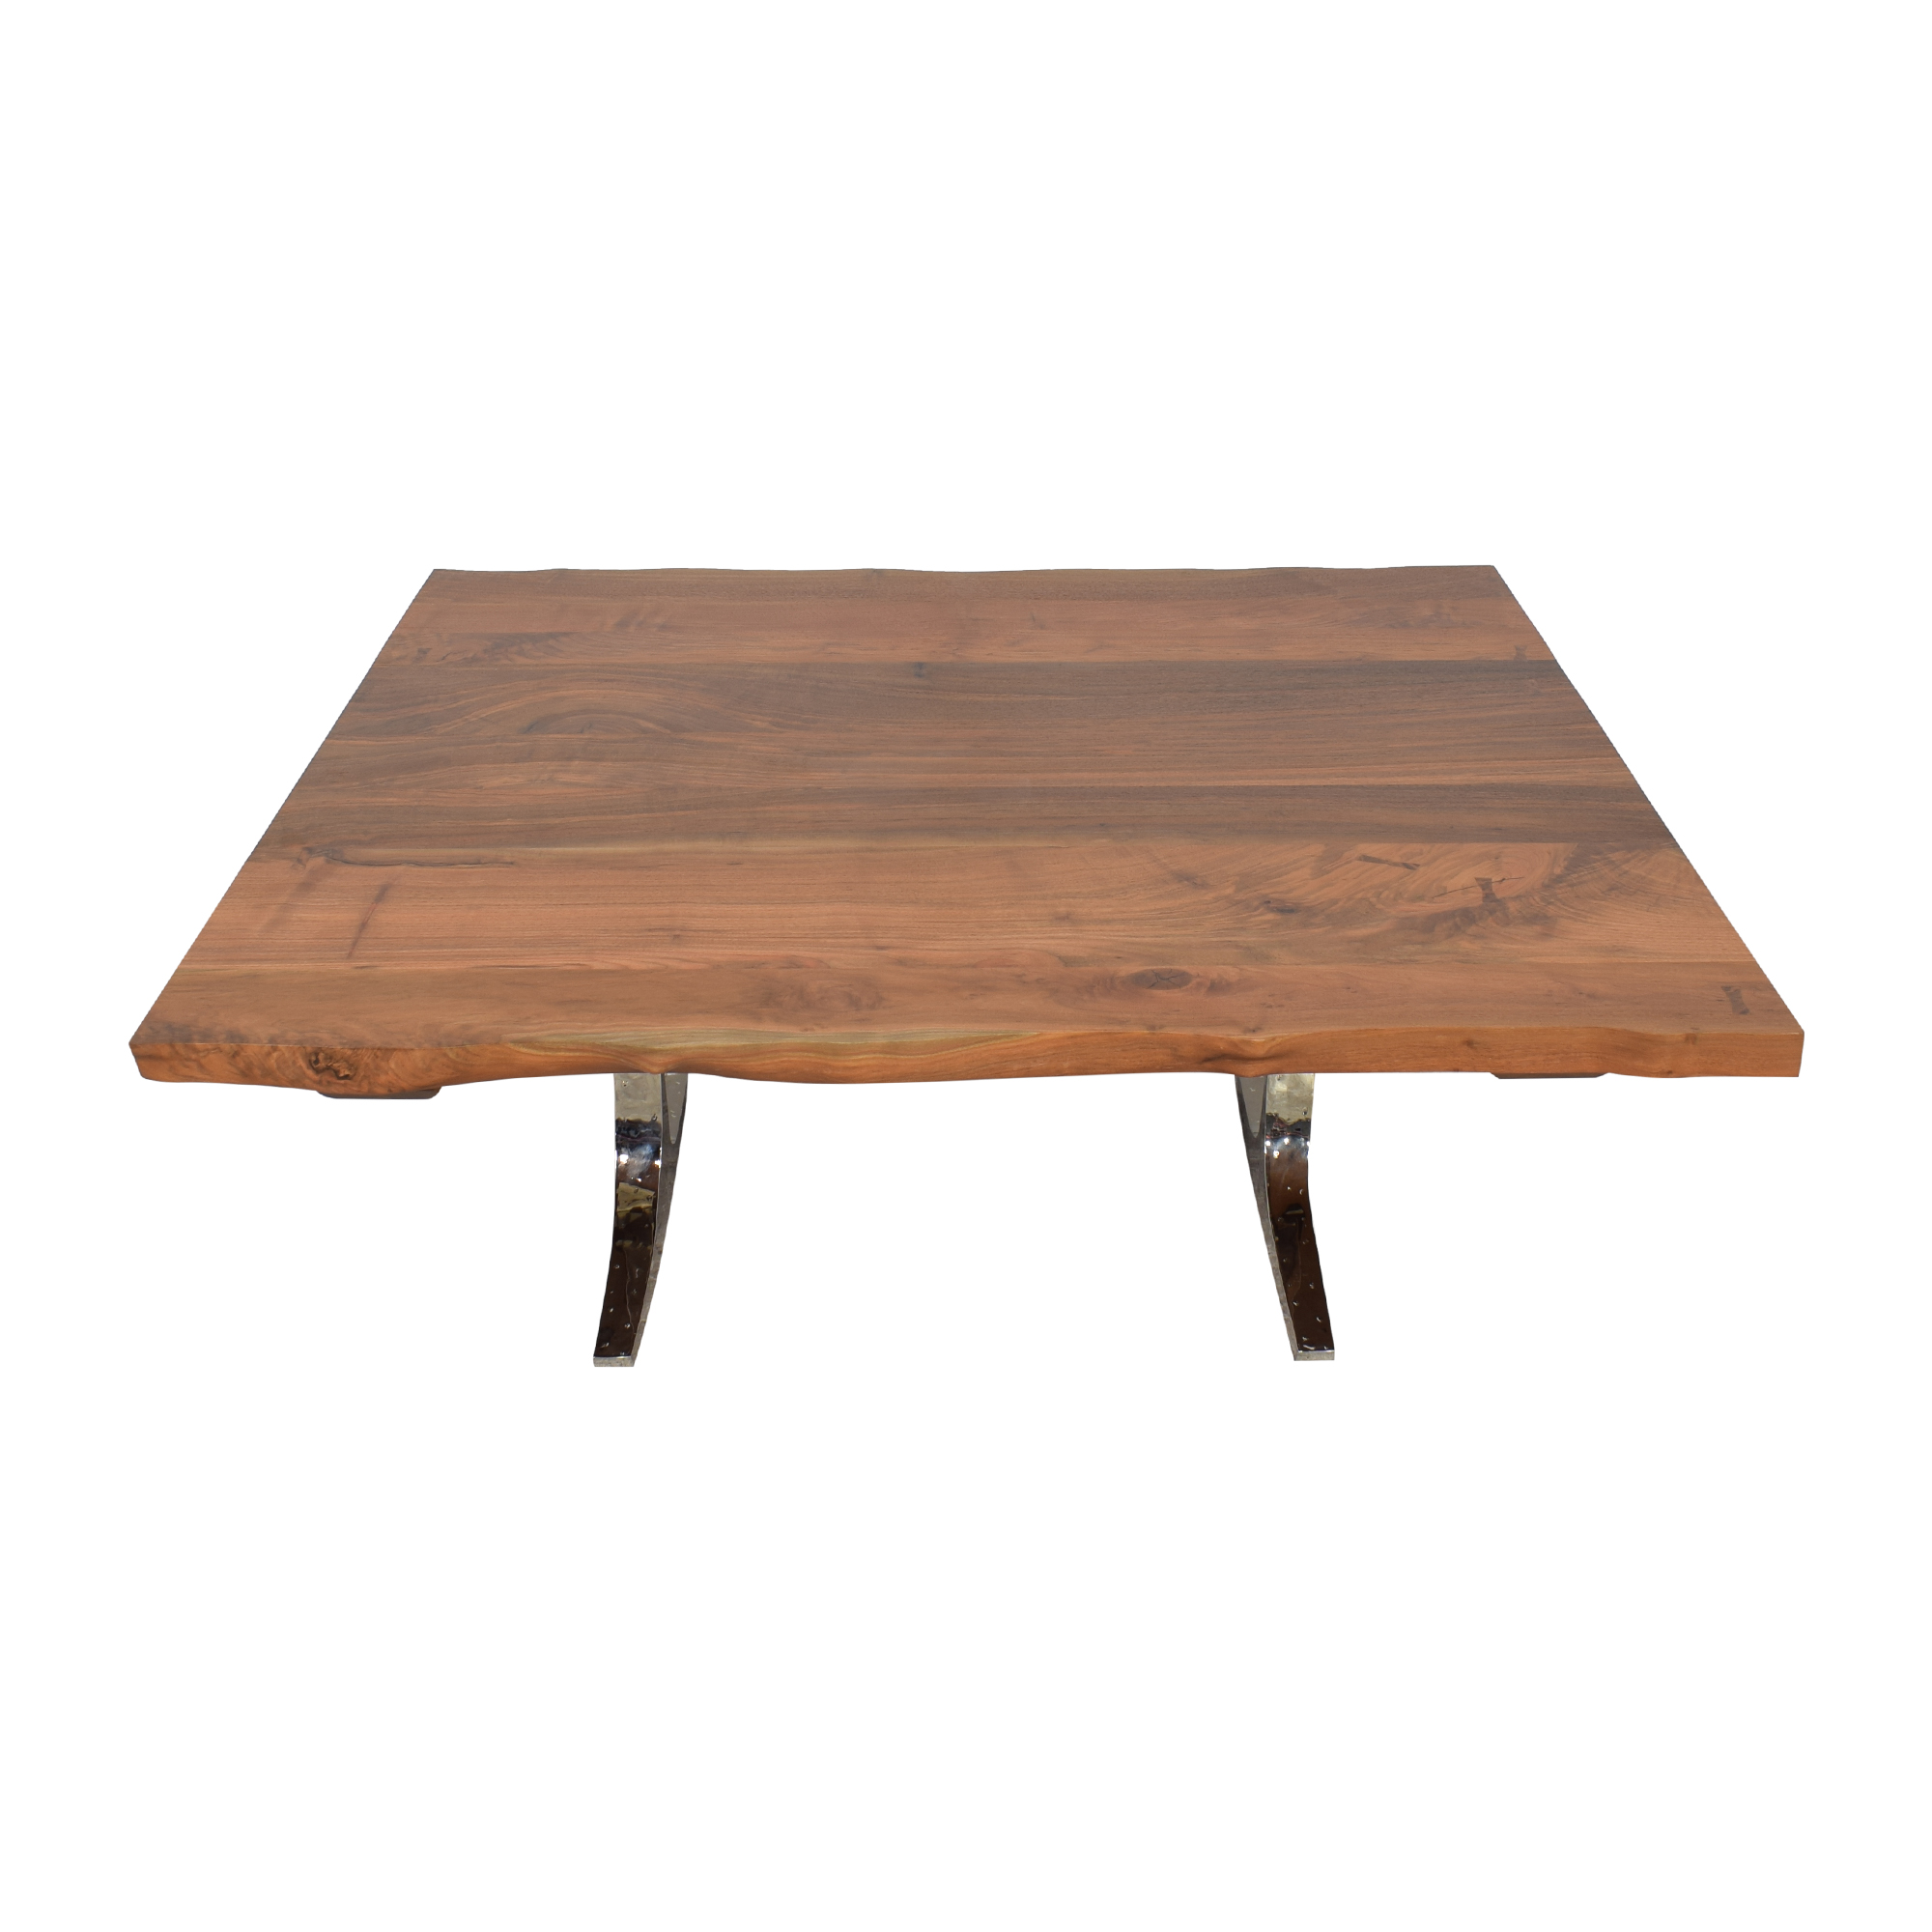 Hudson Furniture & Bedding Hudson Furniture Live Edge Dining Table Dinner Tables